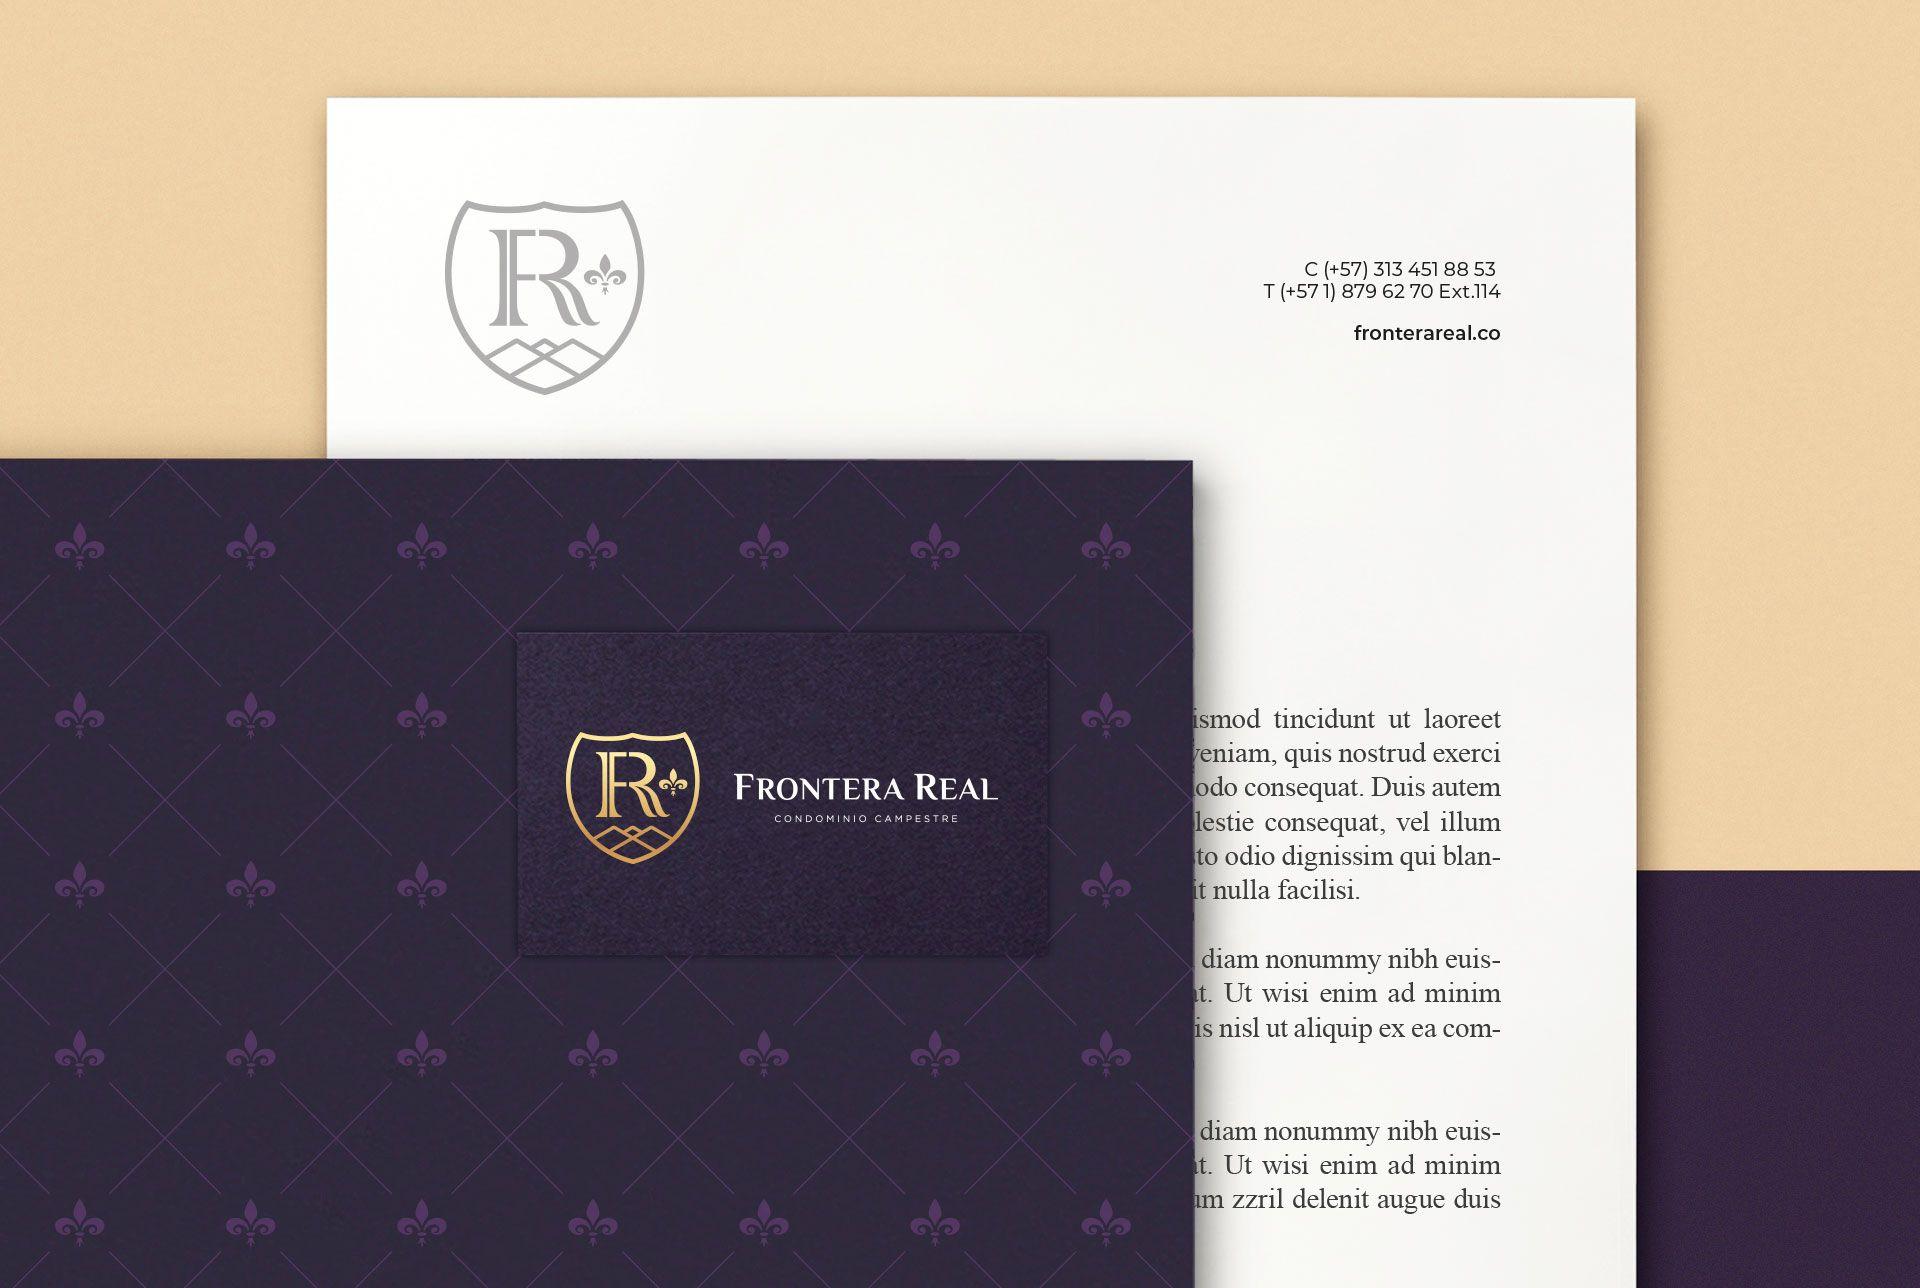 Fronteral-Real-03-compressor